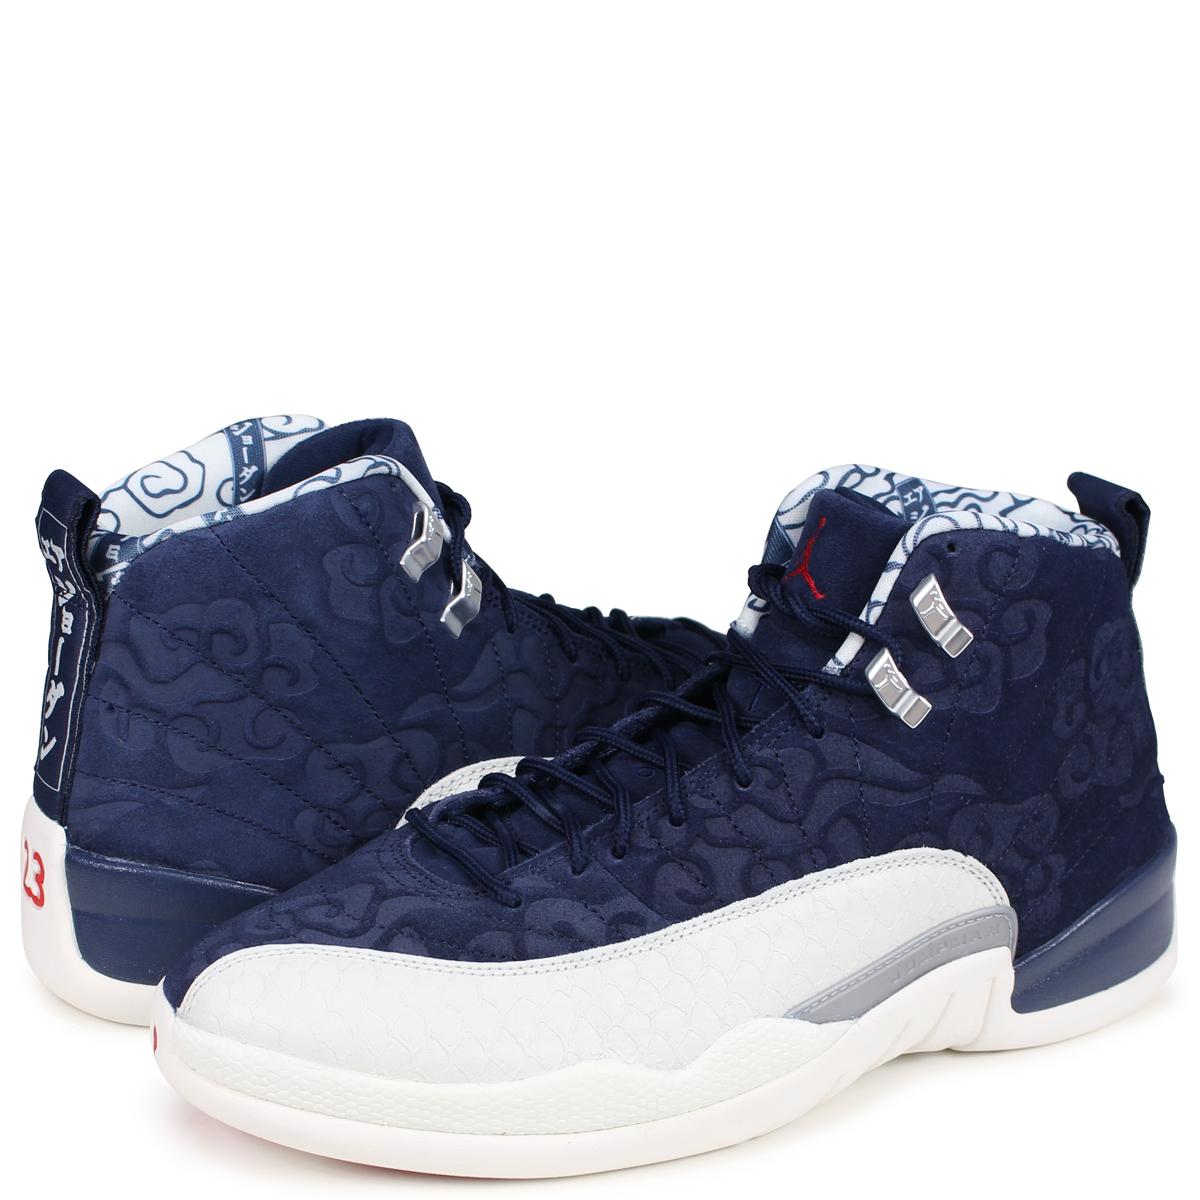 buy online 468e2 823a8 NIKE AIR JORDAN 12 RETRO INTERNATIONAL FLIGHT Nike Air Jordan 12 nostalgic  sneakers men BV8016-445 navy [1810]